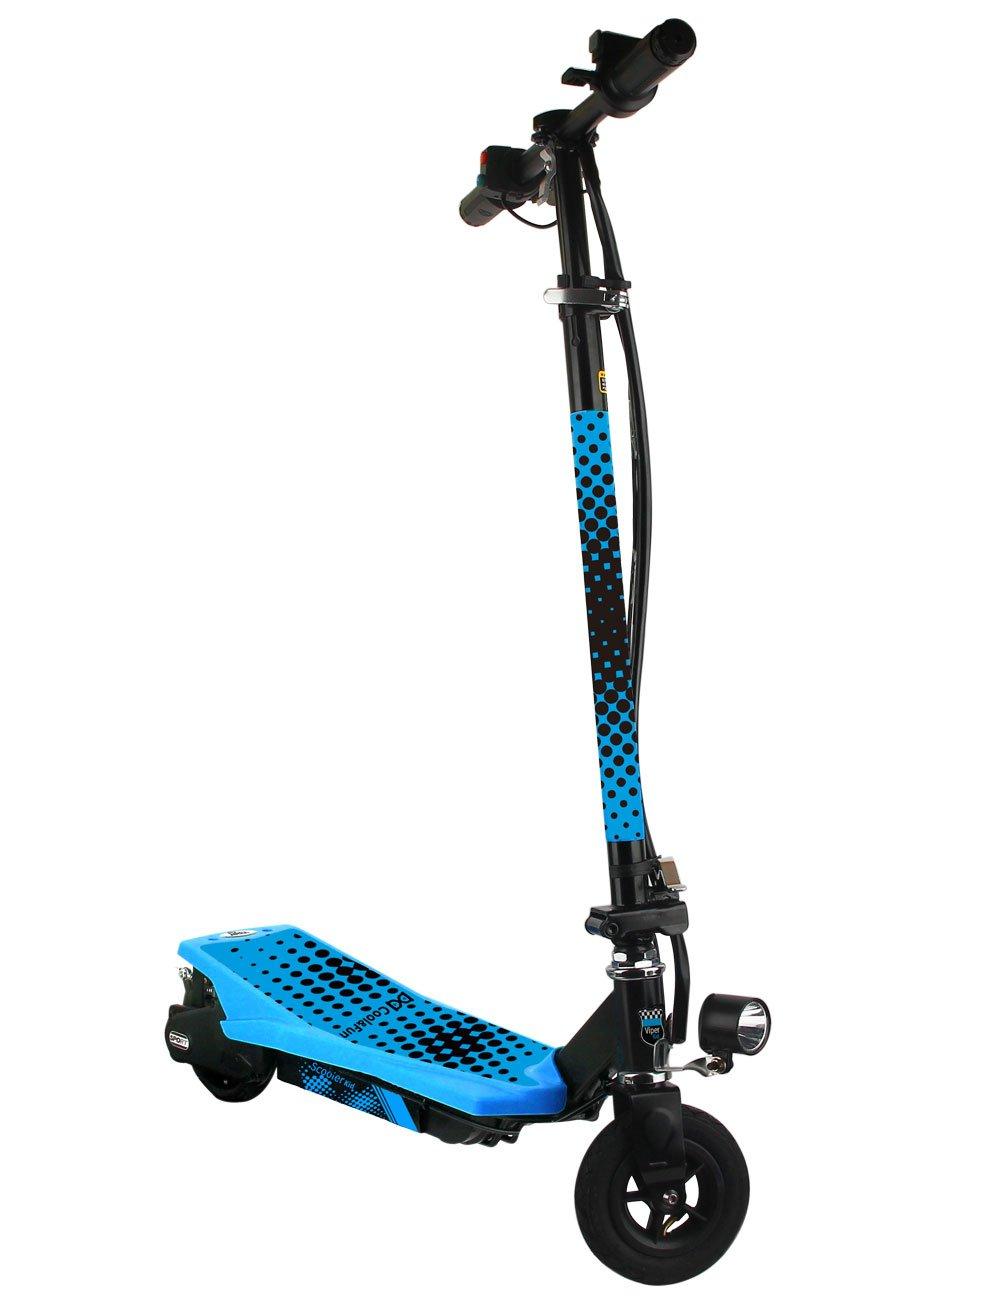 Cool&Fun Scooter Eléctrico Plegable 150W (Blue): Amazon.es ...